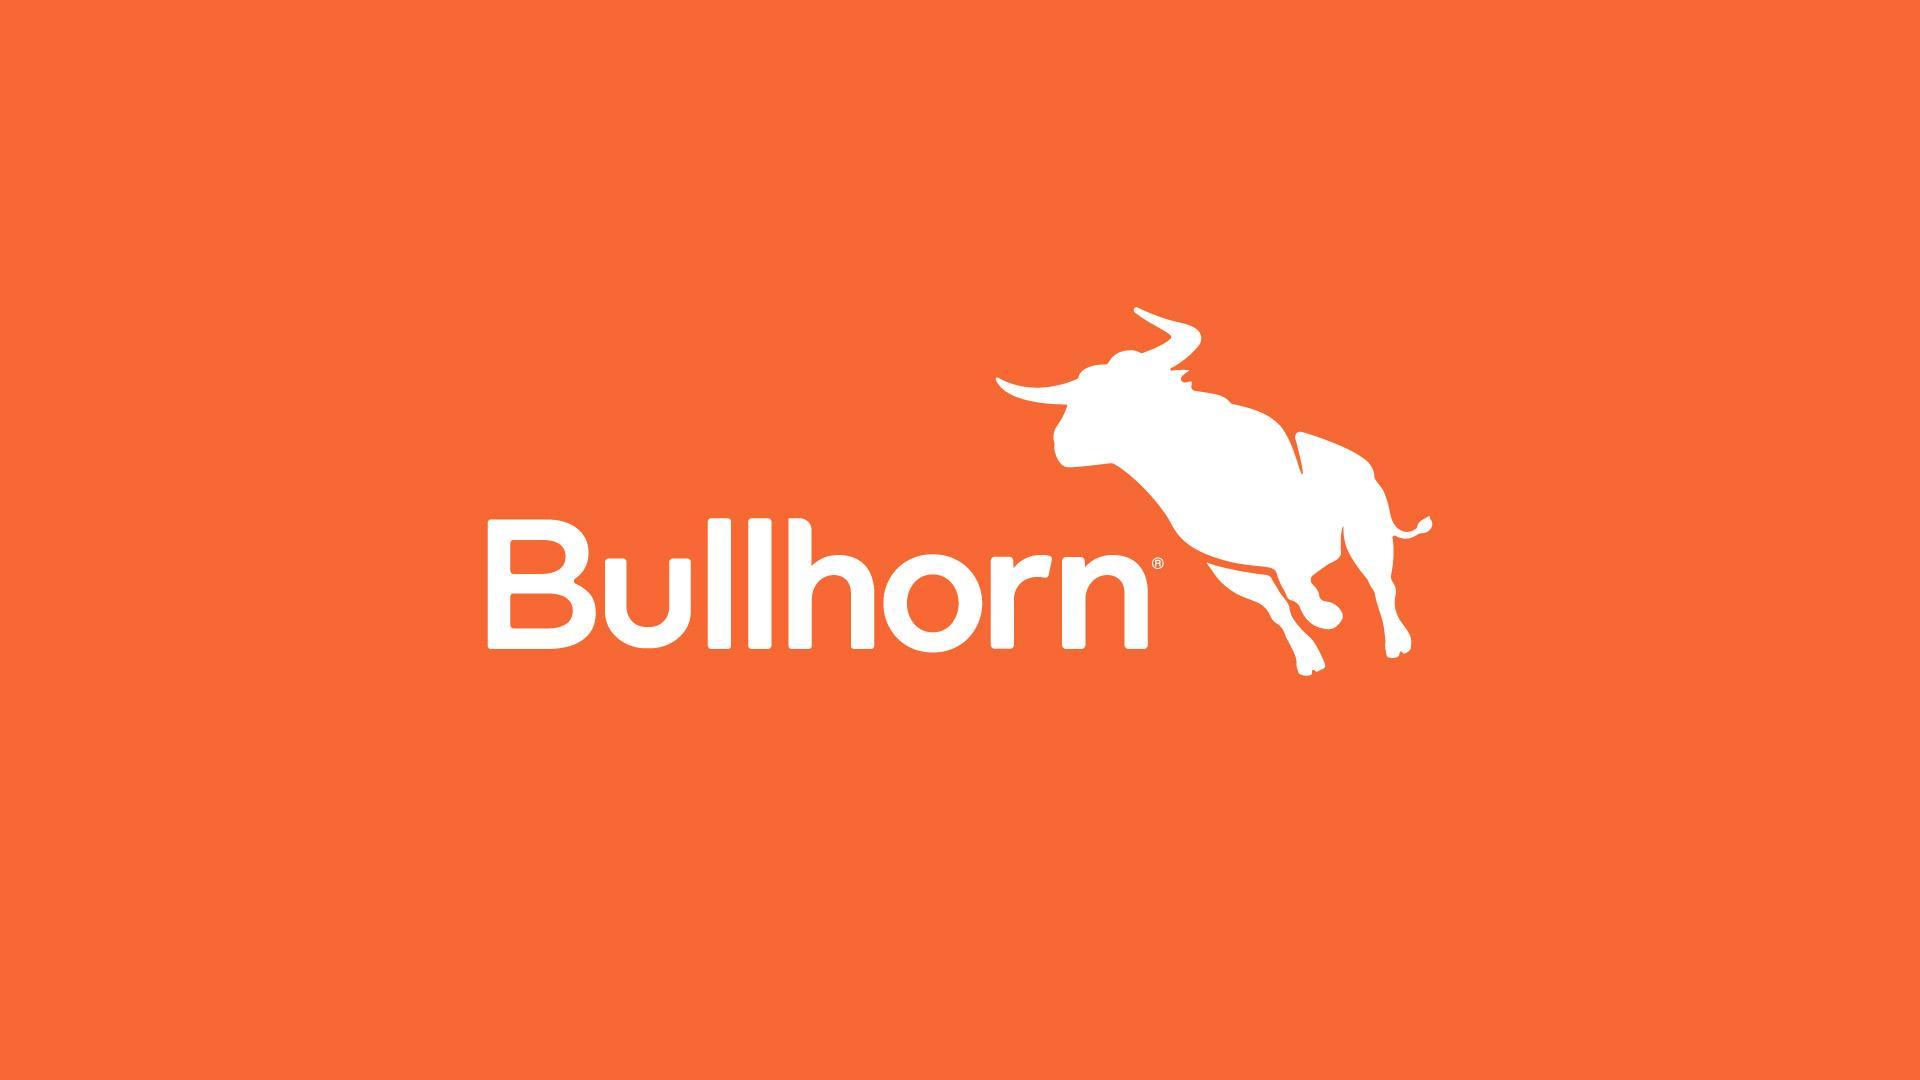 Bullhorn applicant tracking system integration logo